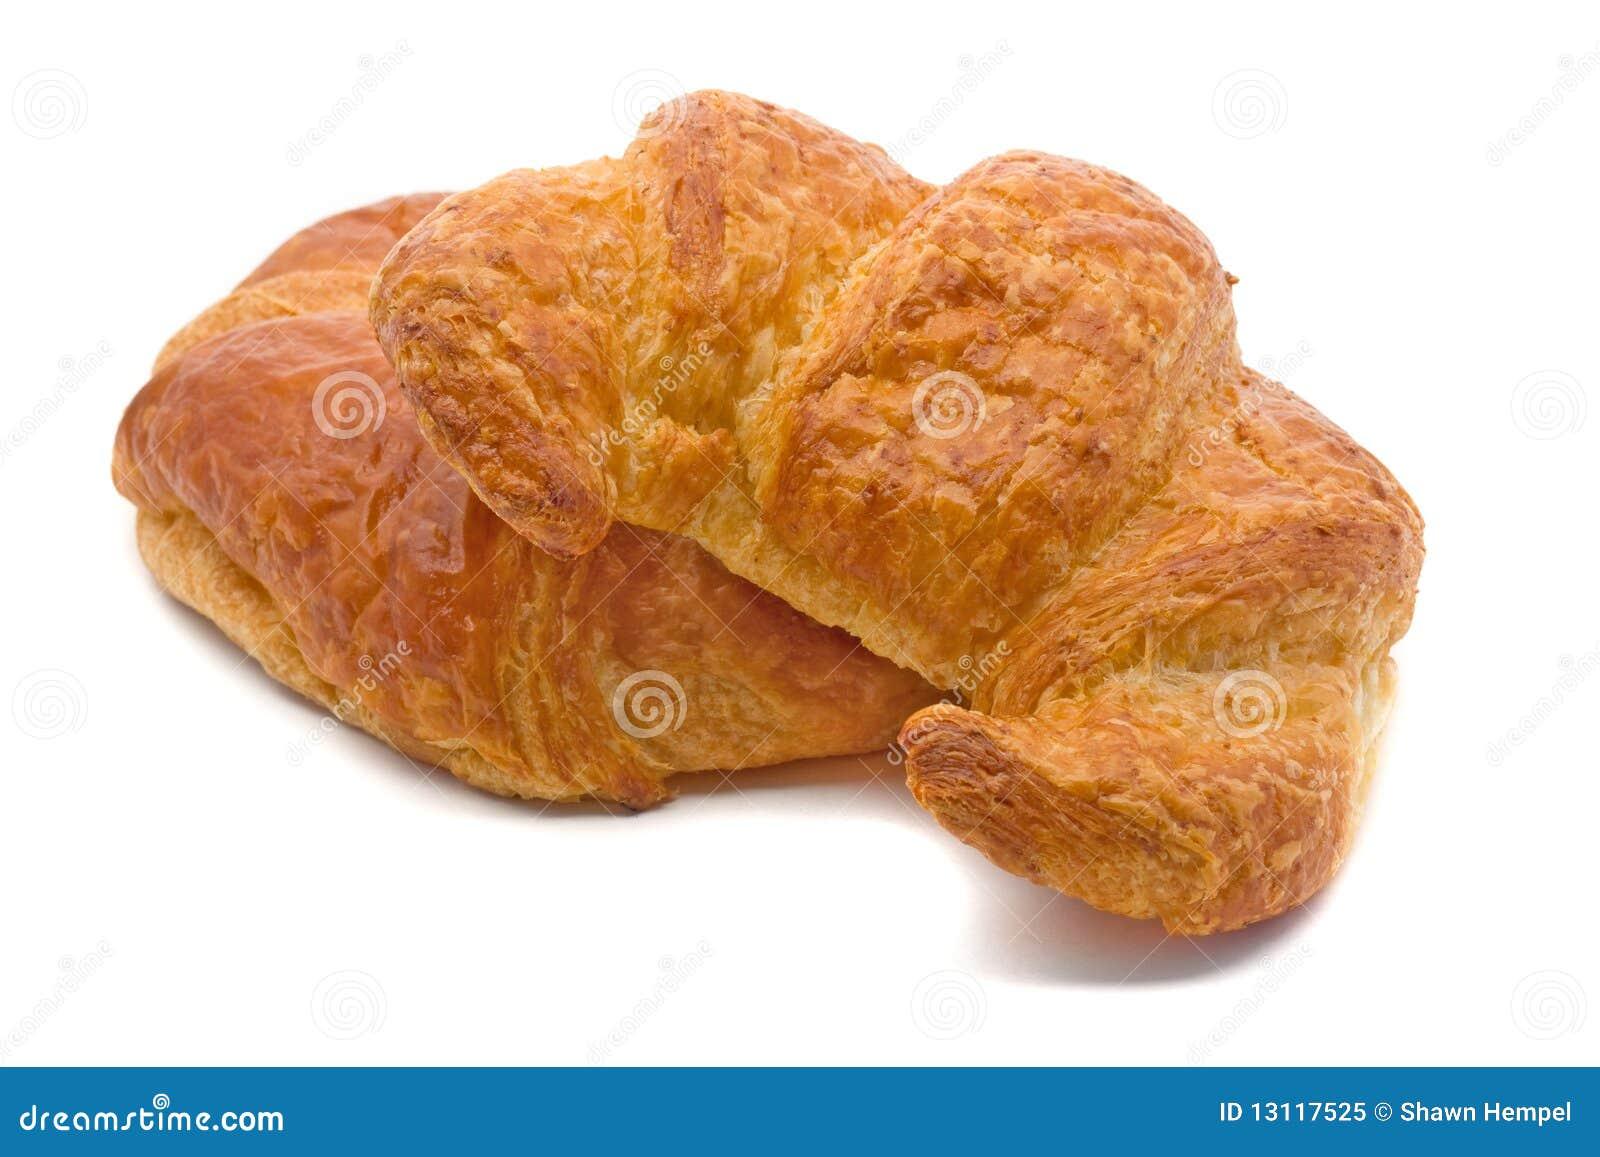 Croissants Royalty Free Stock Photo - Image: 13117525